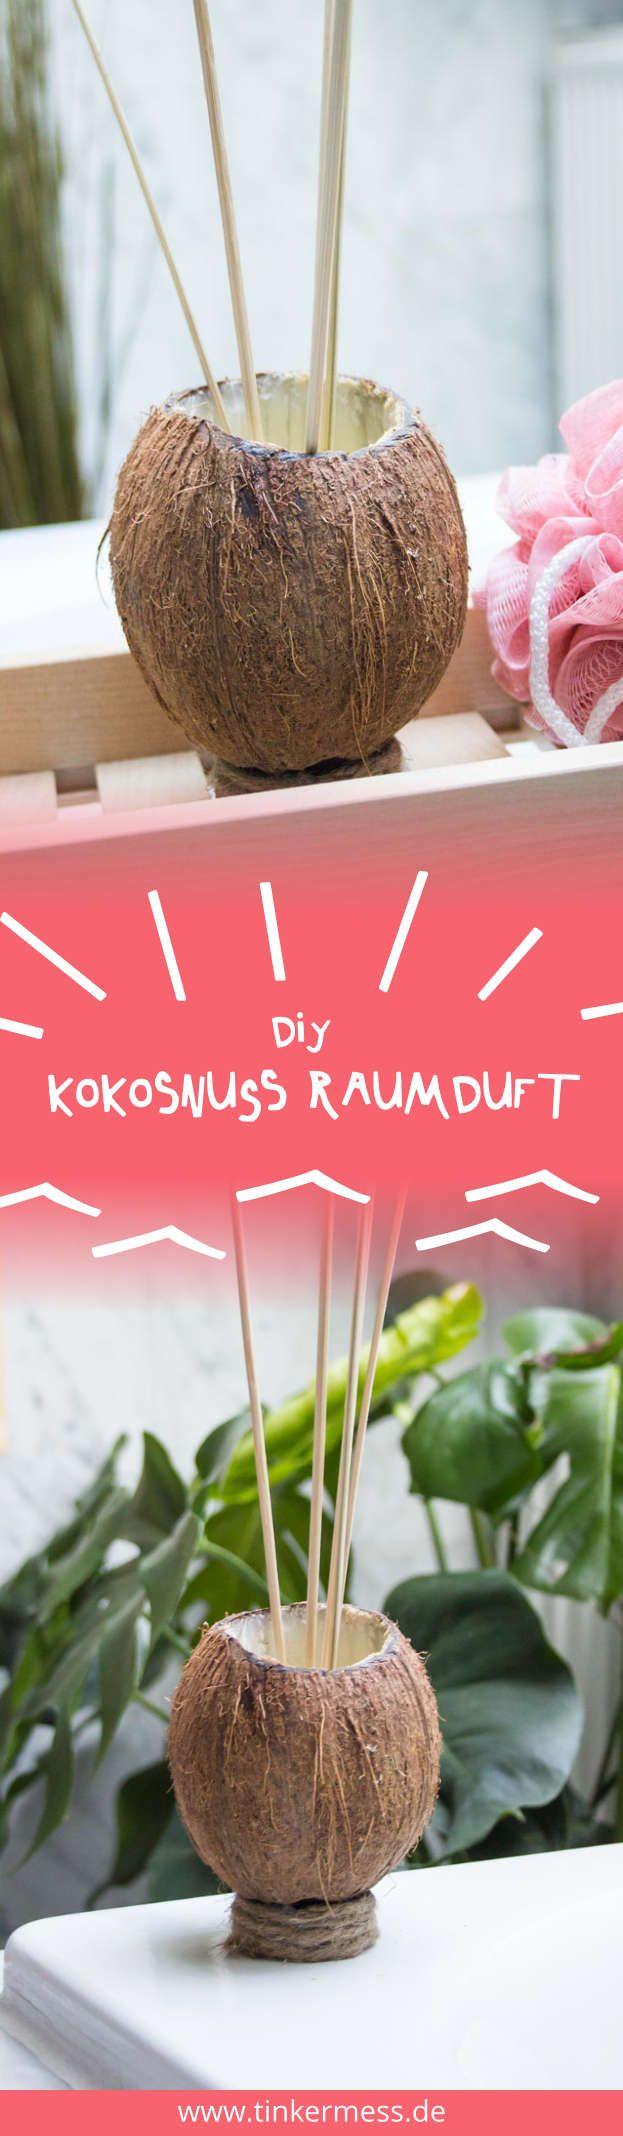 DIY Kokosnuss Raumduft Selber Machen